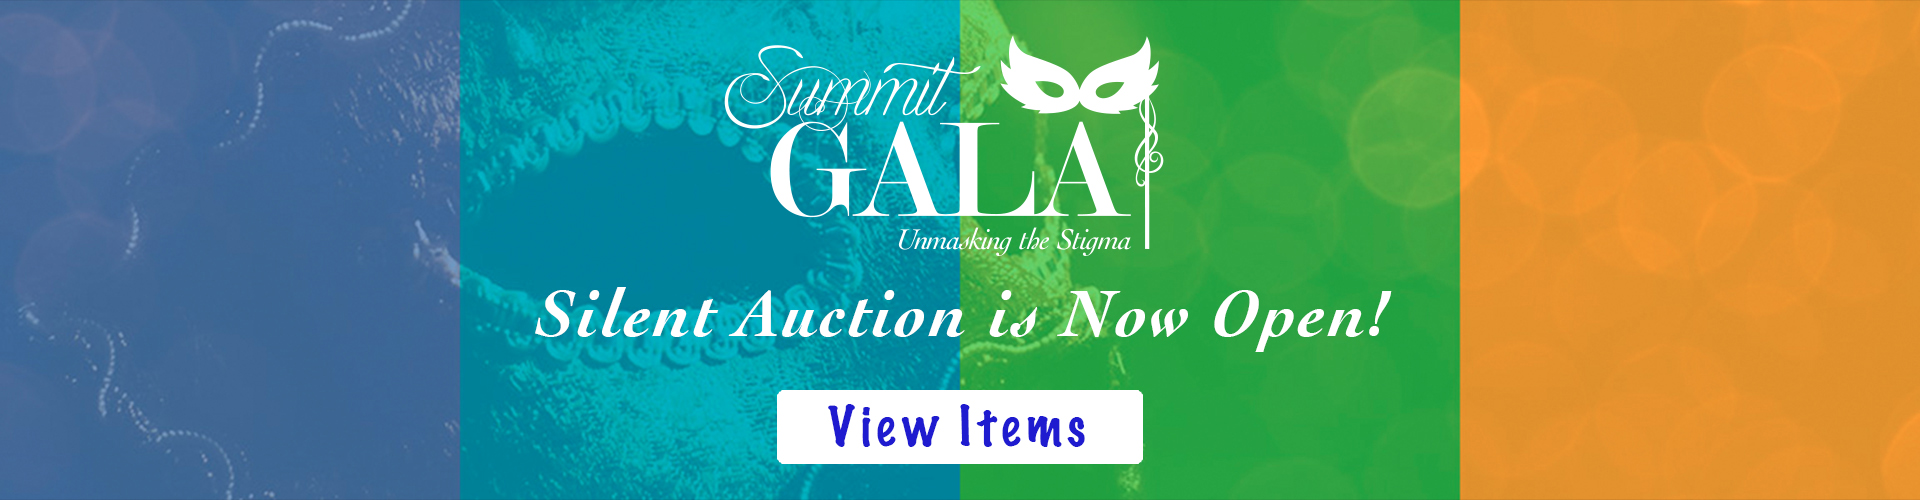 summit-auction-banner-homepage